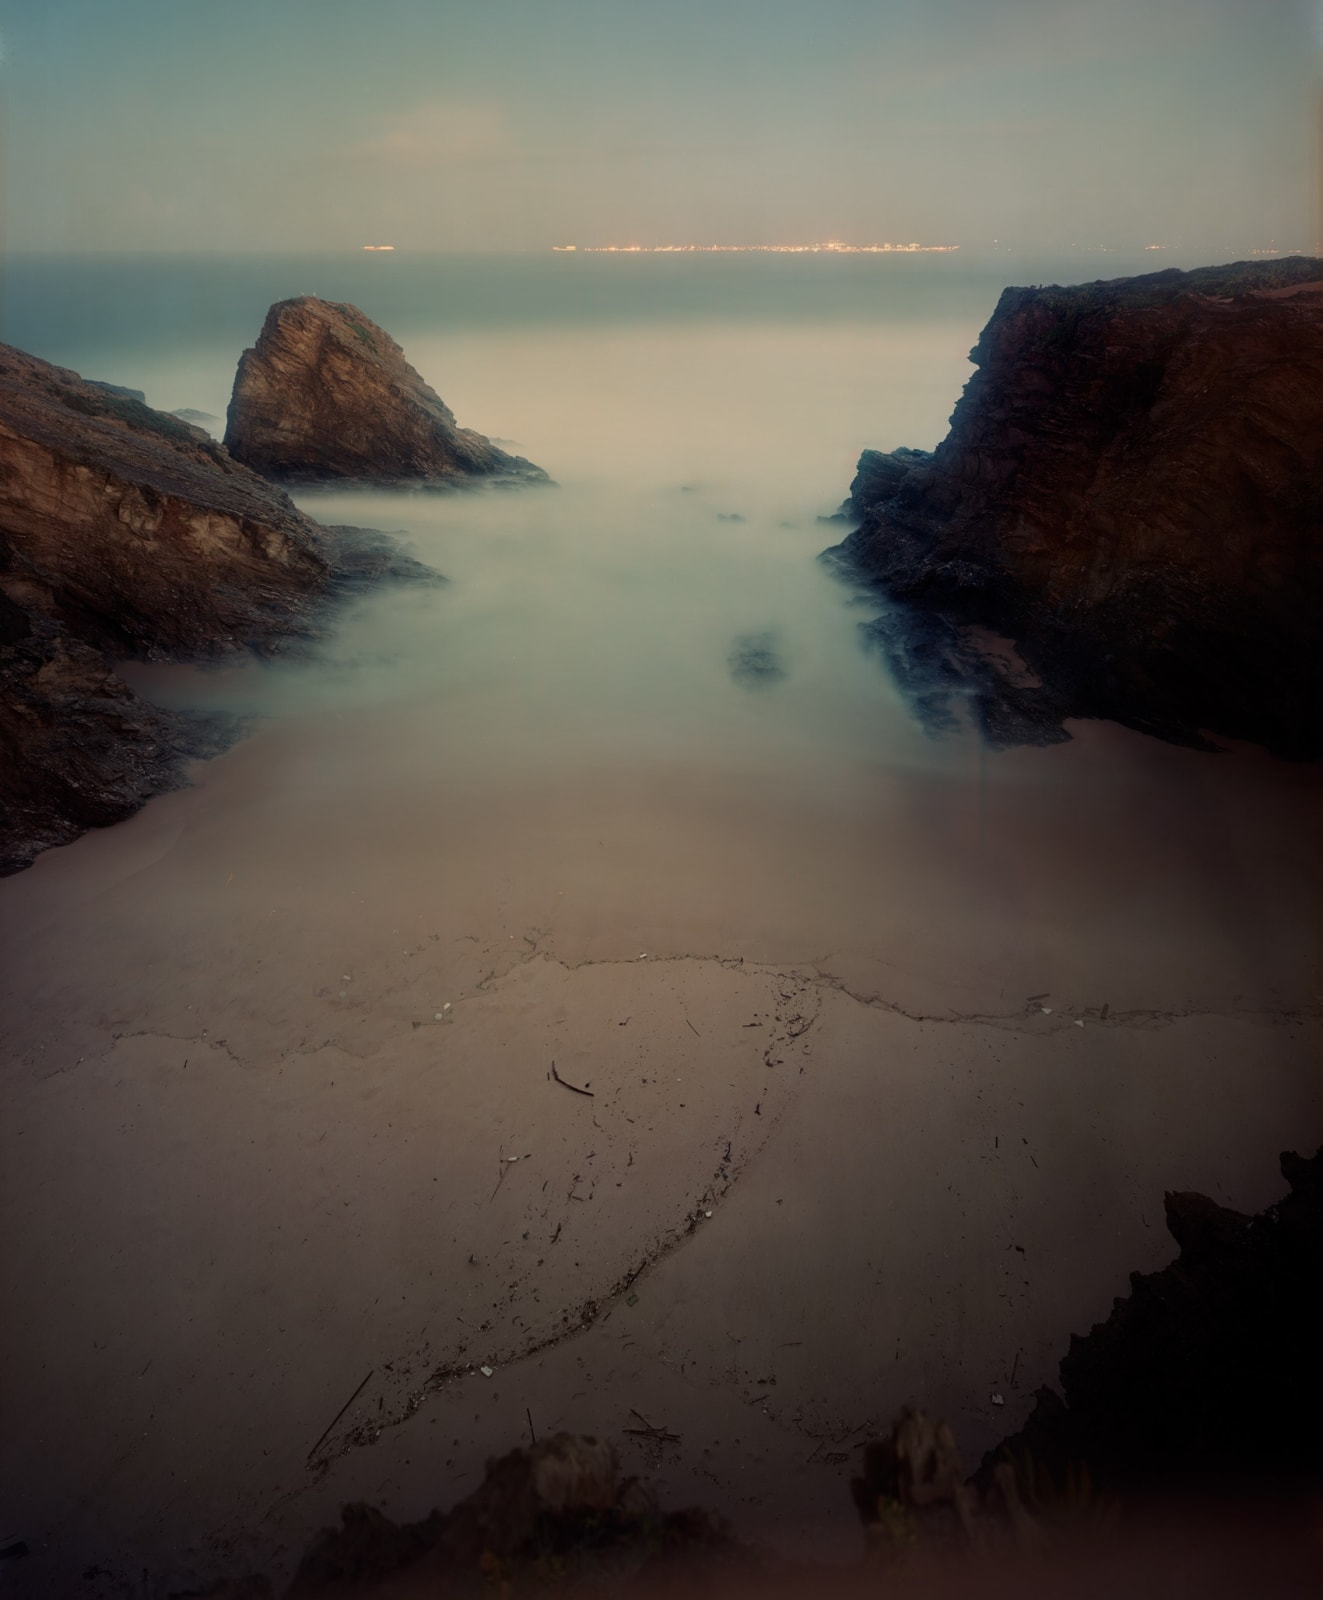 Christian Chaize Praia-Piquinia 26/10/13 5h17 à 7h27 lightning storm